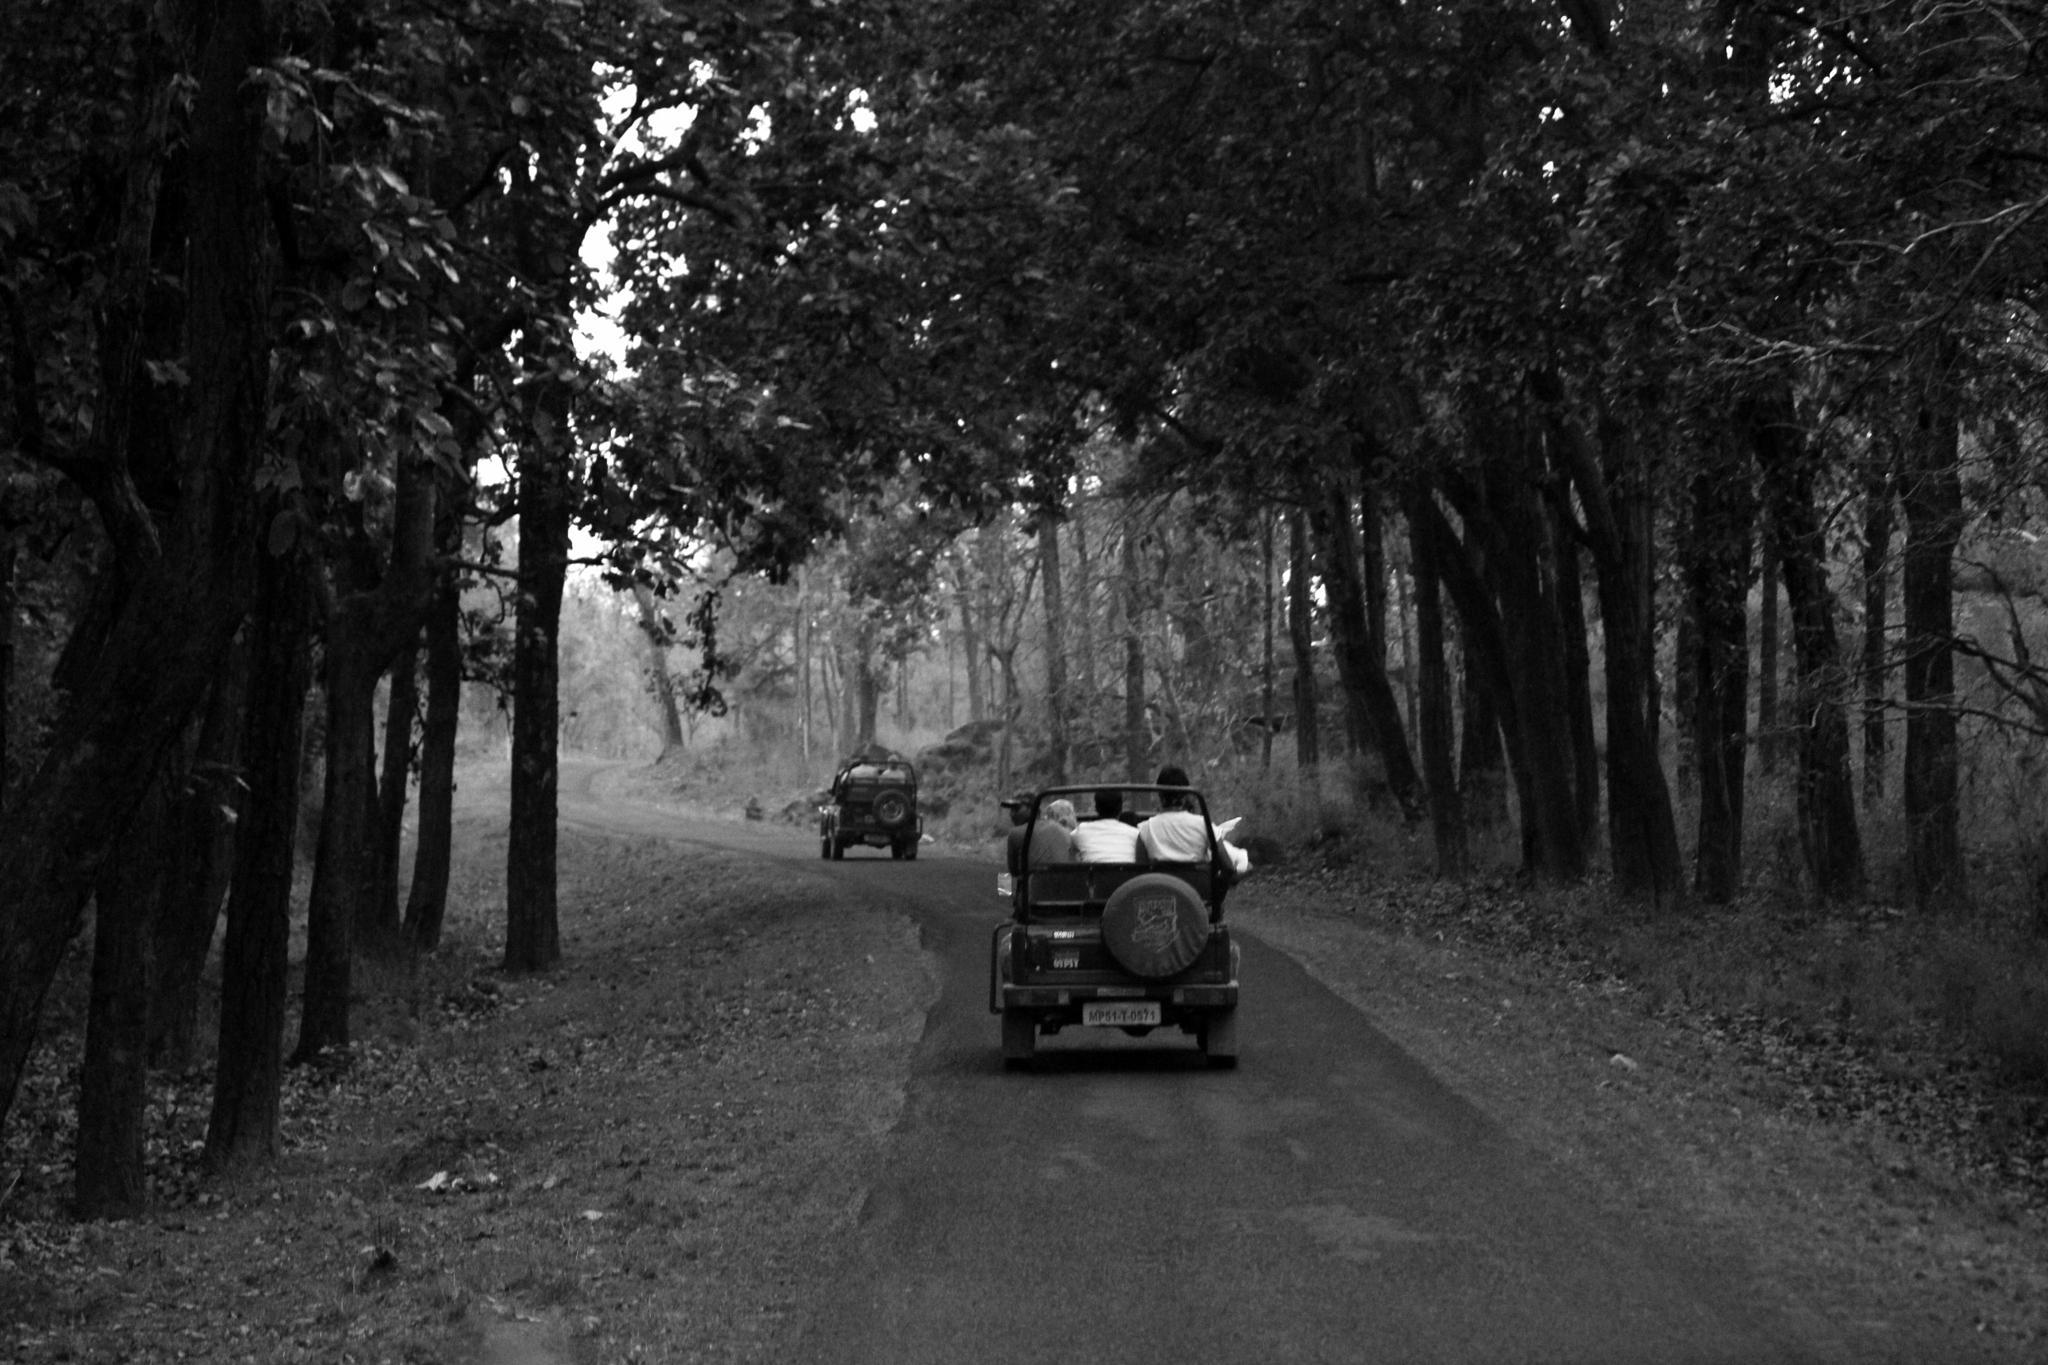 Jungle of Kanha by Sameer Wakude